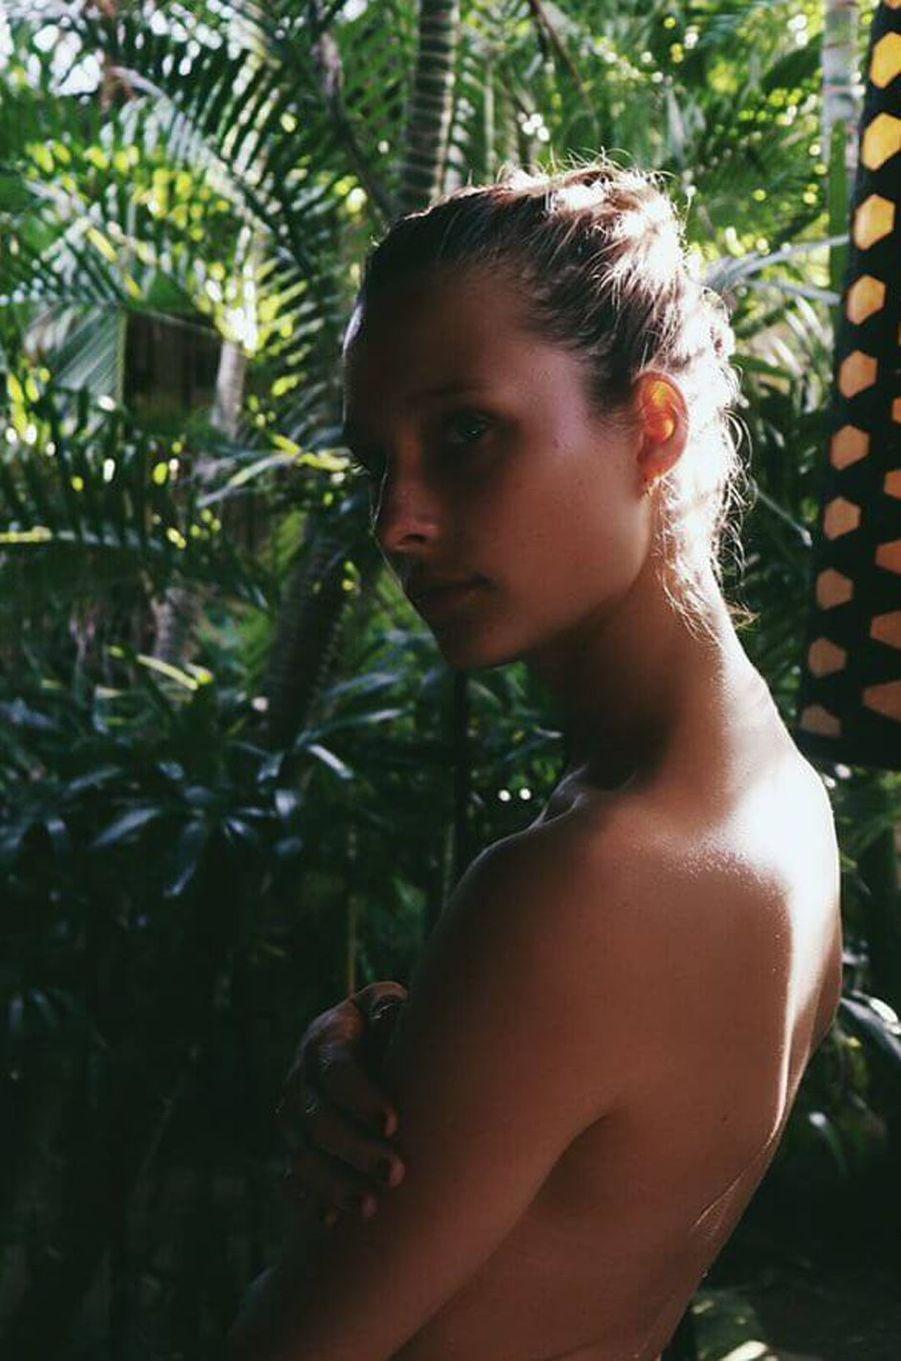 Ilona Smet topless à Bali, en juillet 2017.